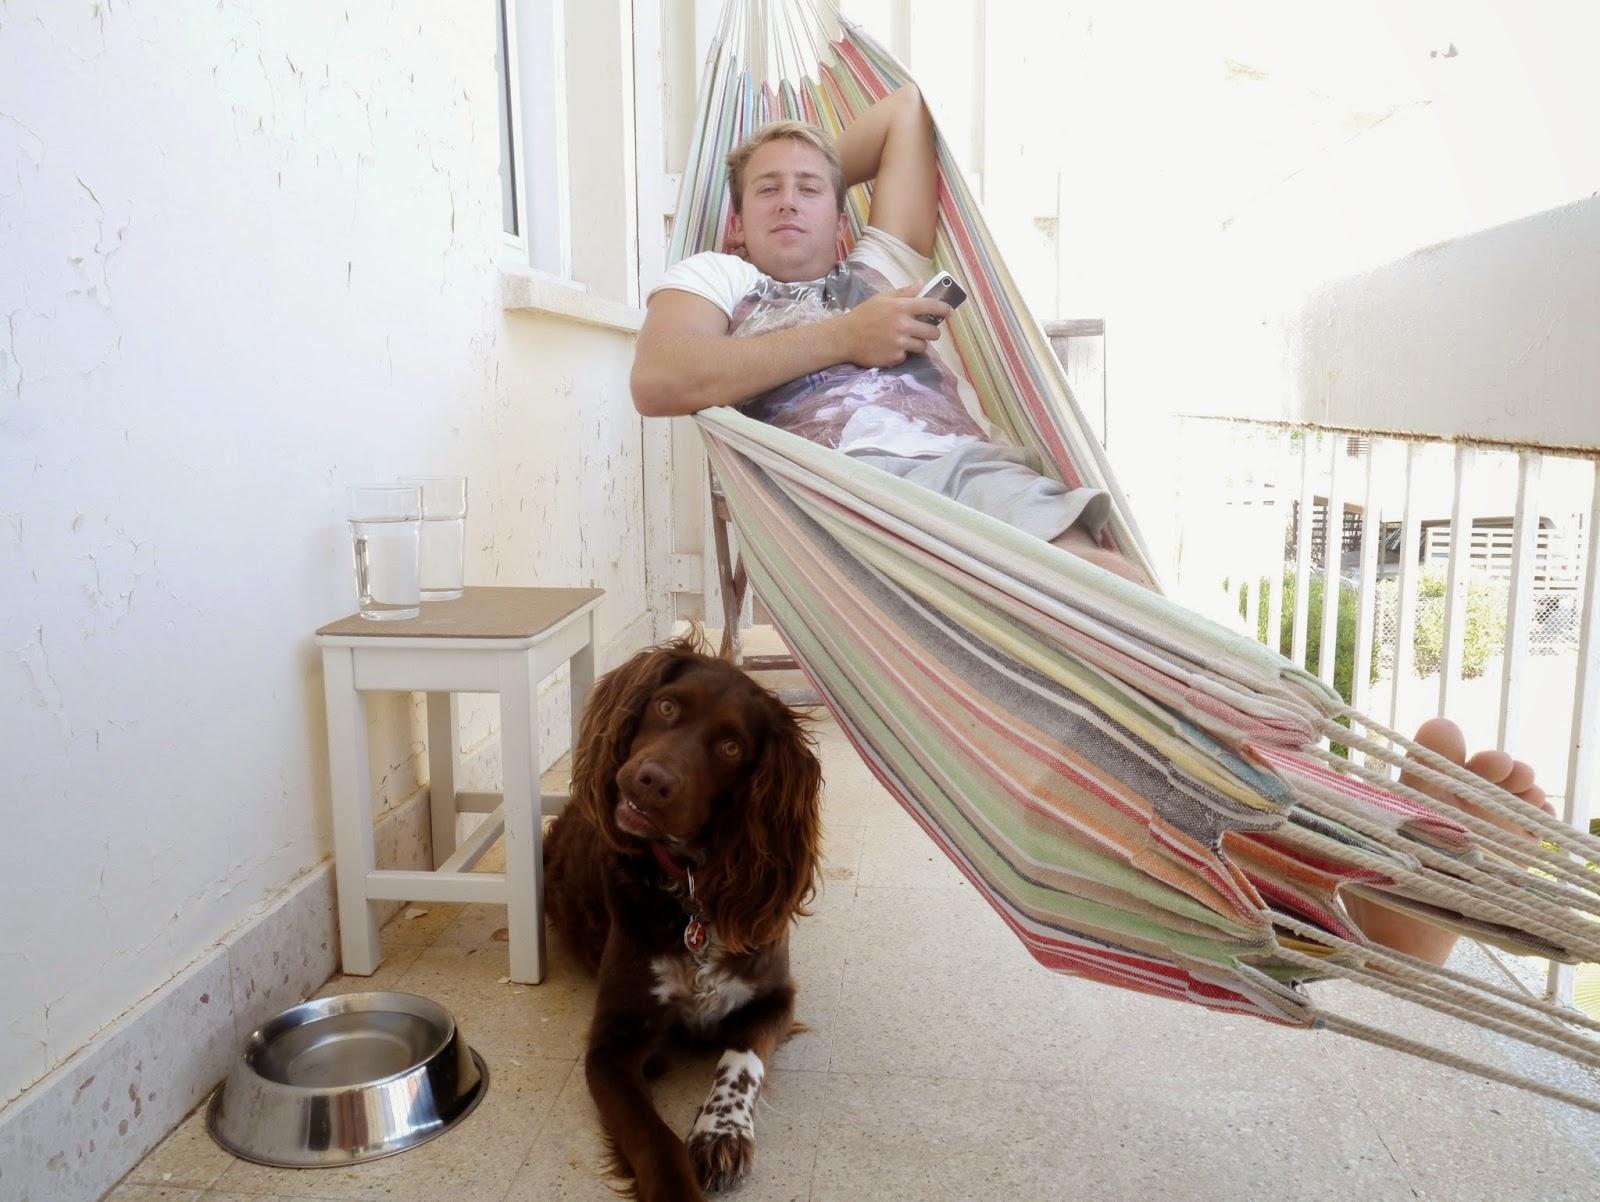 Man in a hammock and springer spaniel dog